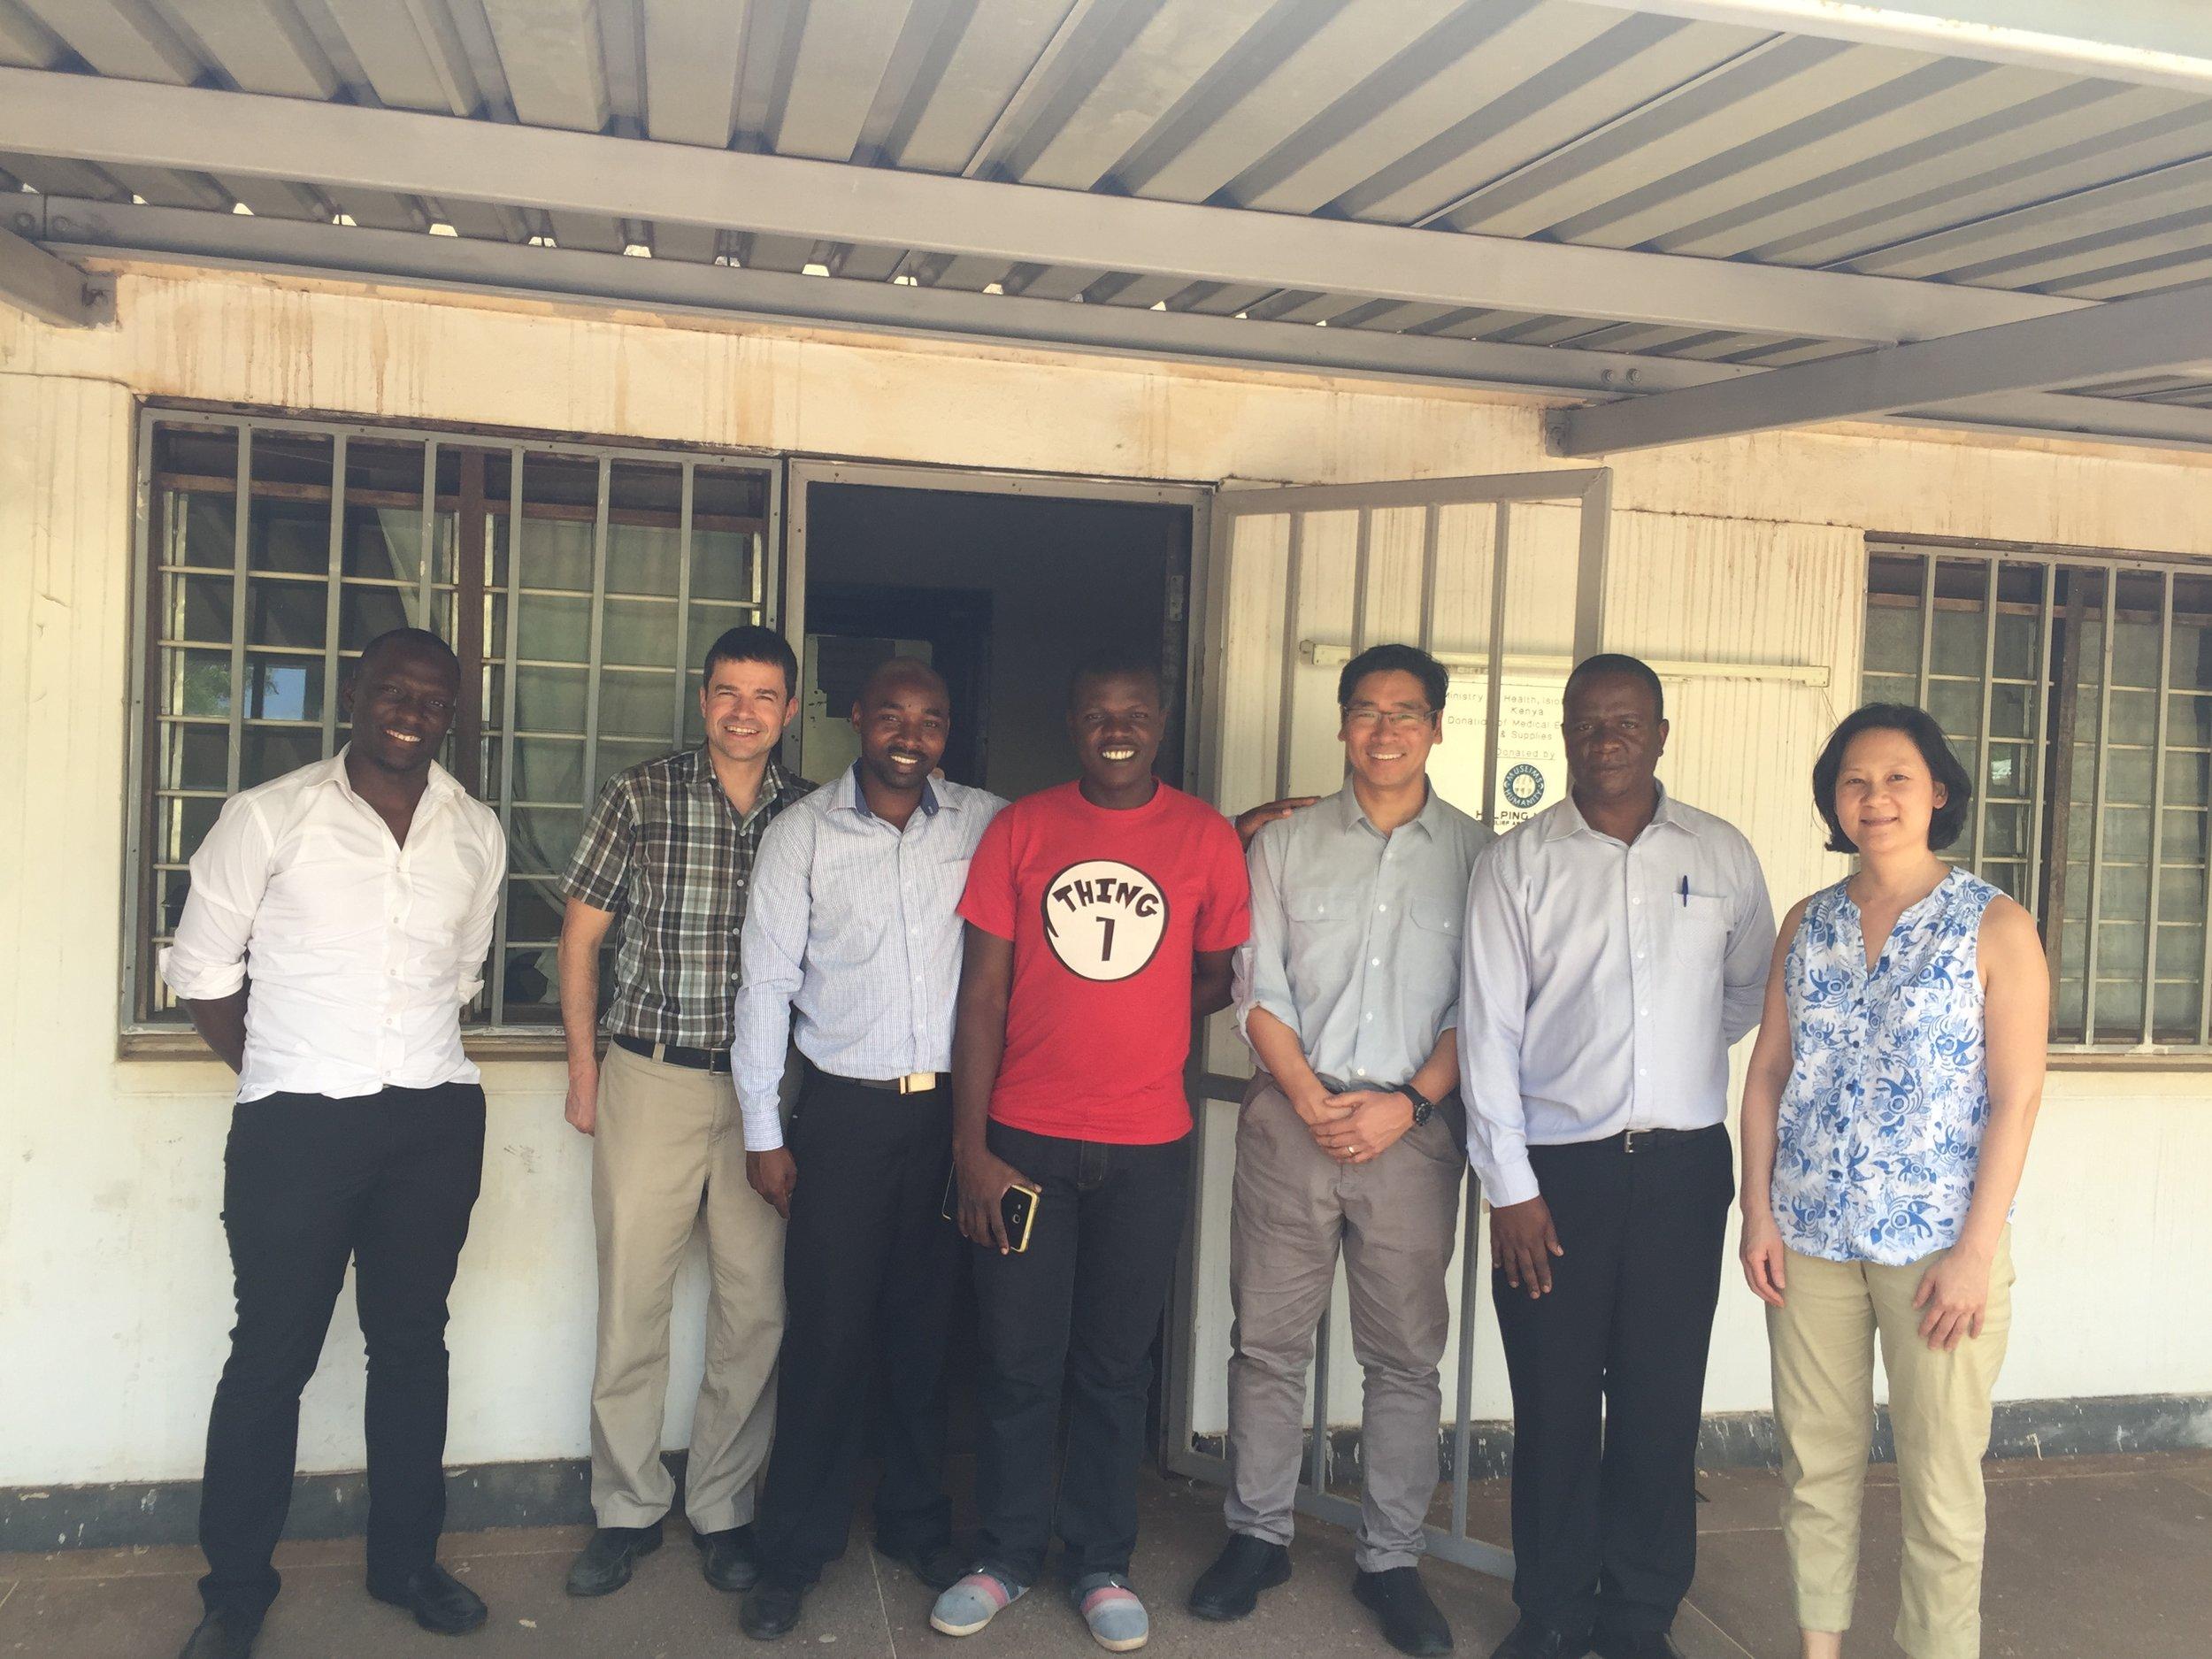 Hagai (nurse at Manyangalu), Dr. Hawkes, Eric (lab tech at Manyangalu), Benard, Dr. Aw, Dr. Kiluova, Dr. Wong at Isiolo Hospital